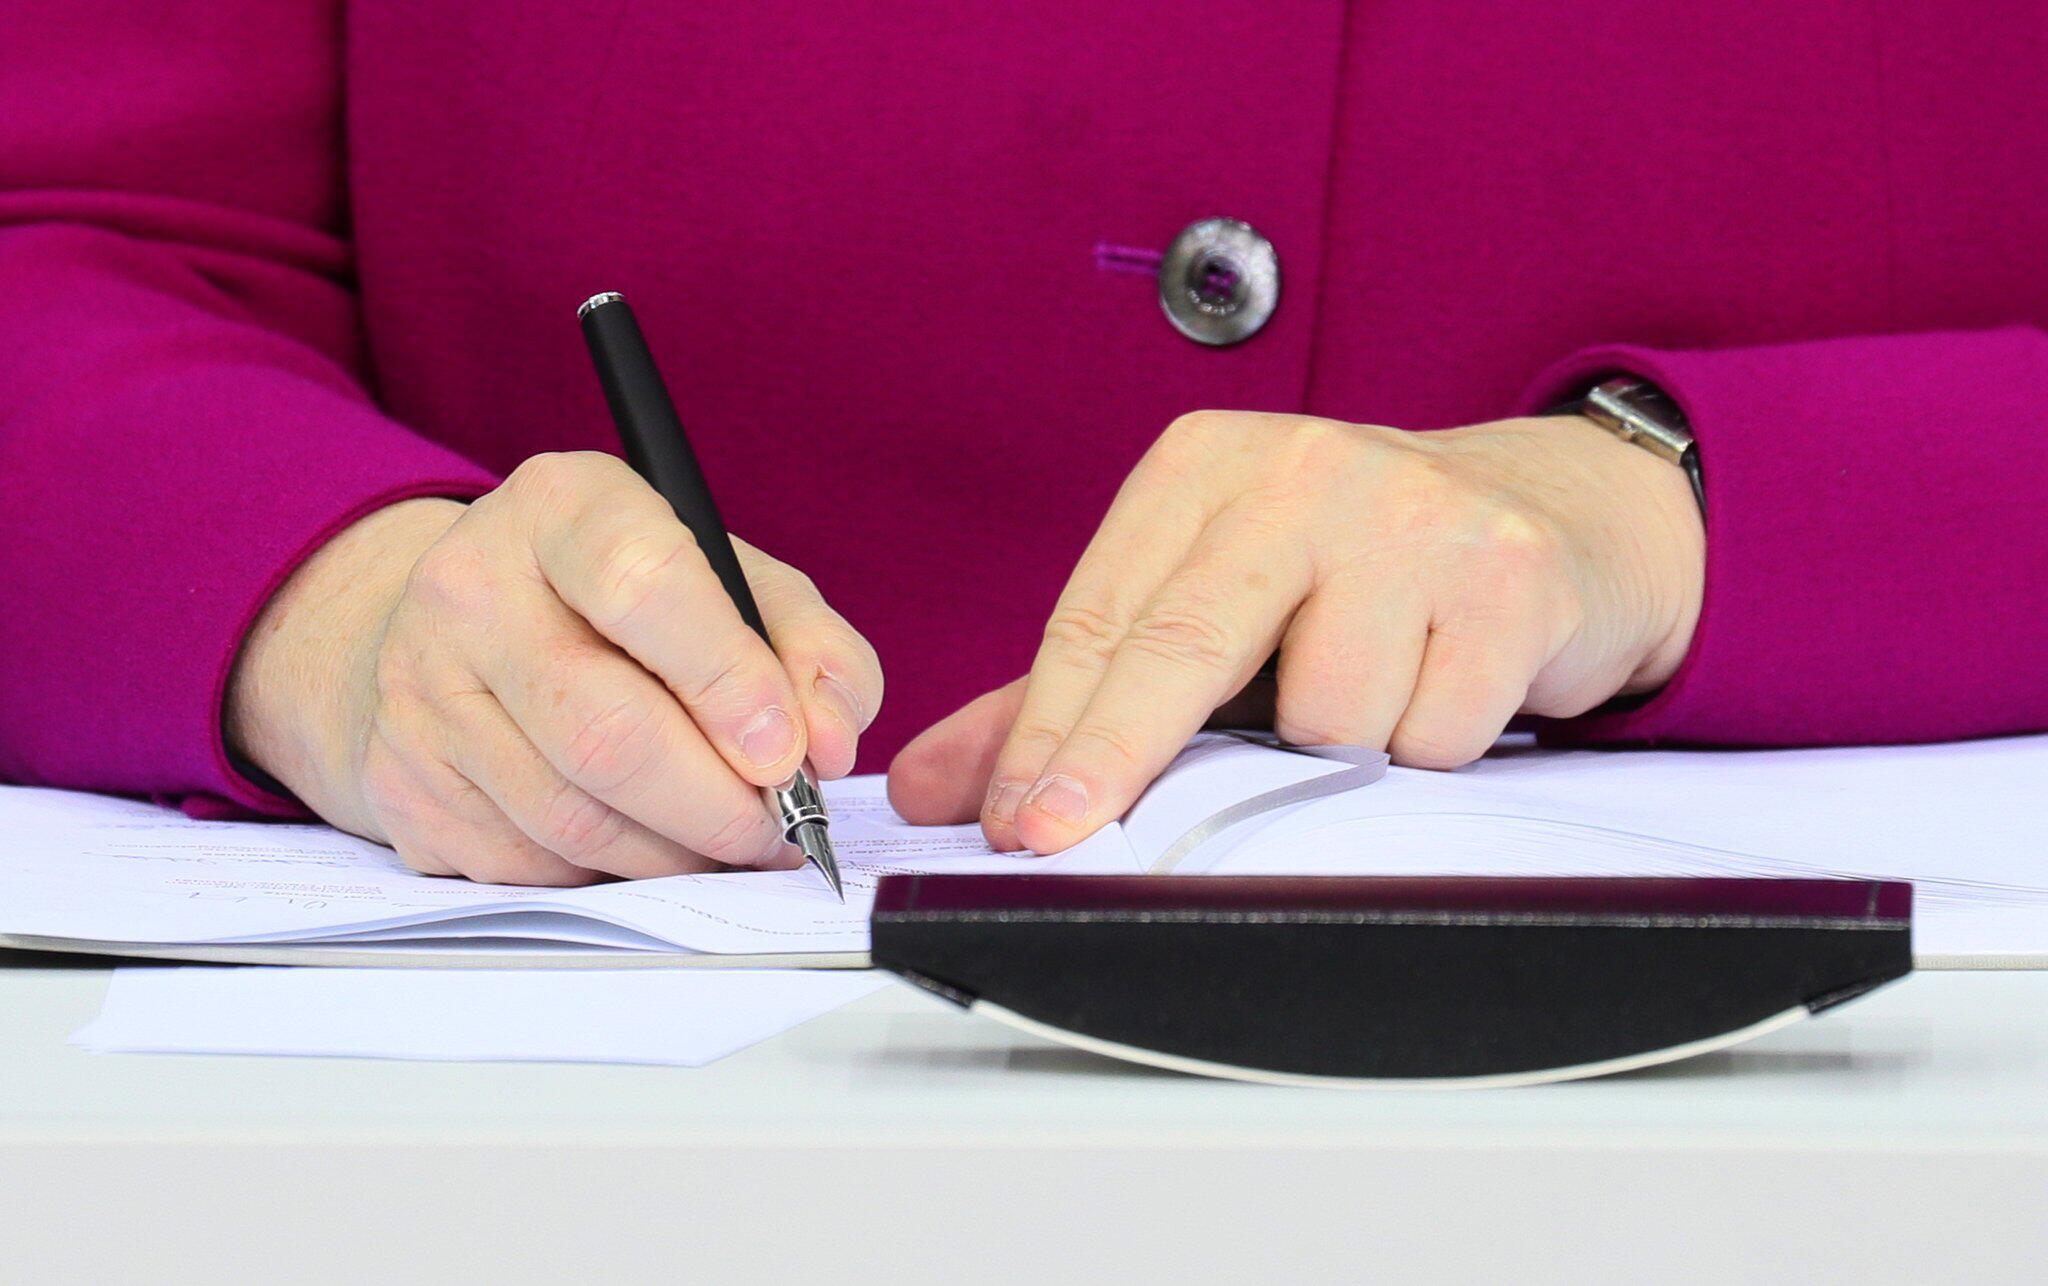 Bild zu Koalition, große Koalition, CDU, CSU, SPD, Angela Merkel, Koalitionsvertrag, Unterschrift